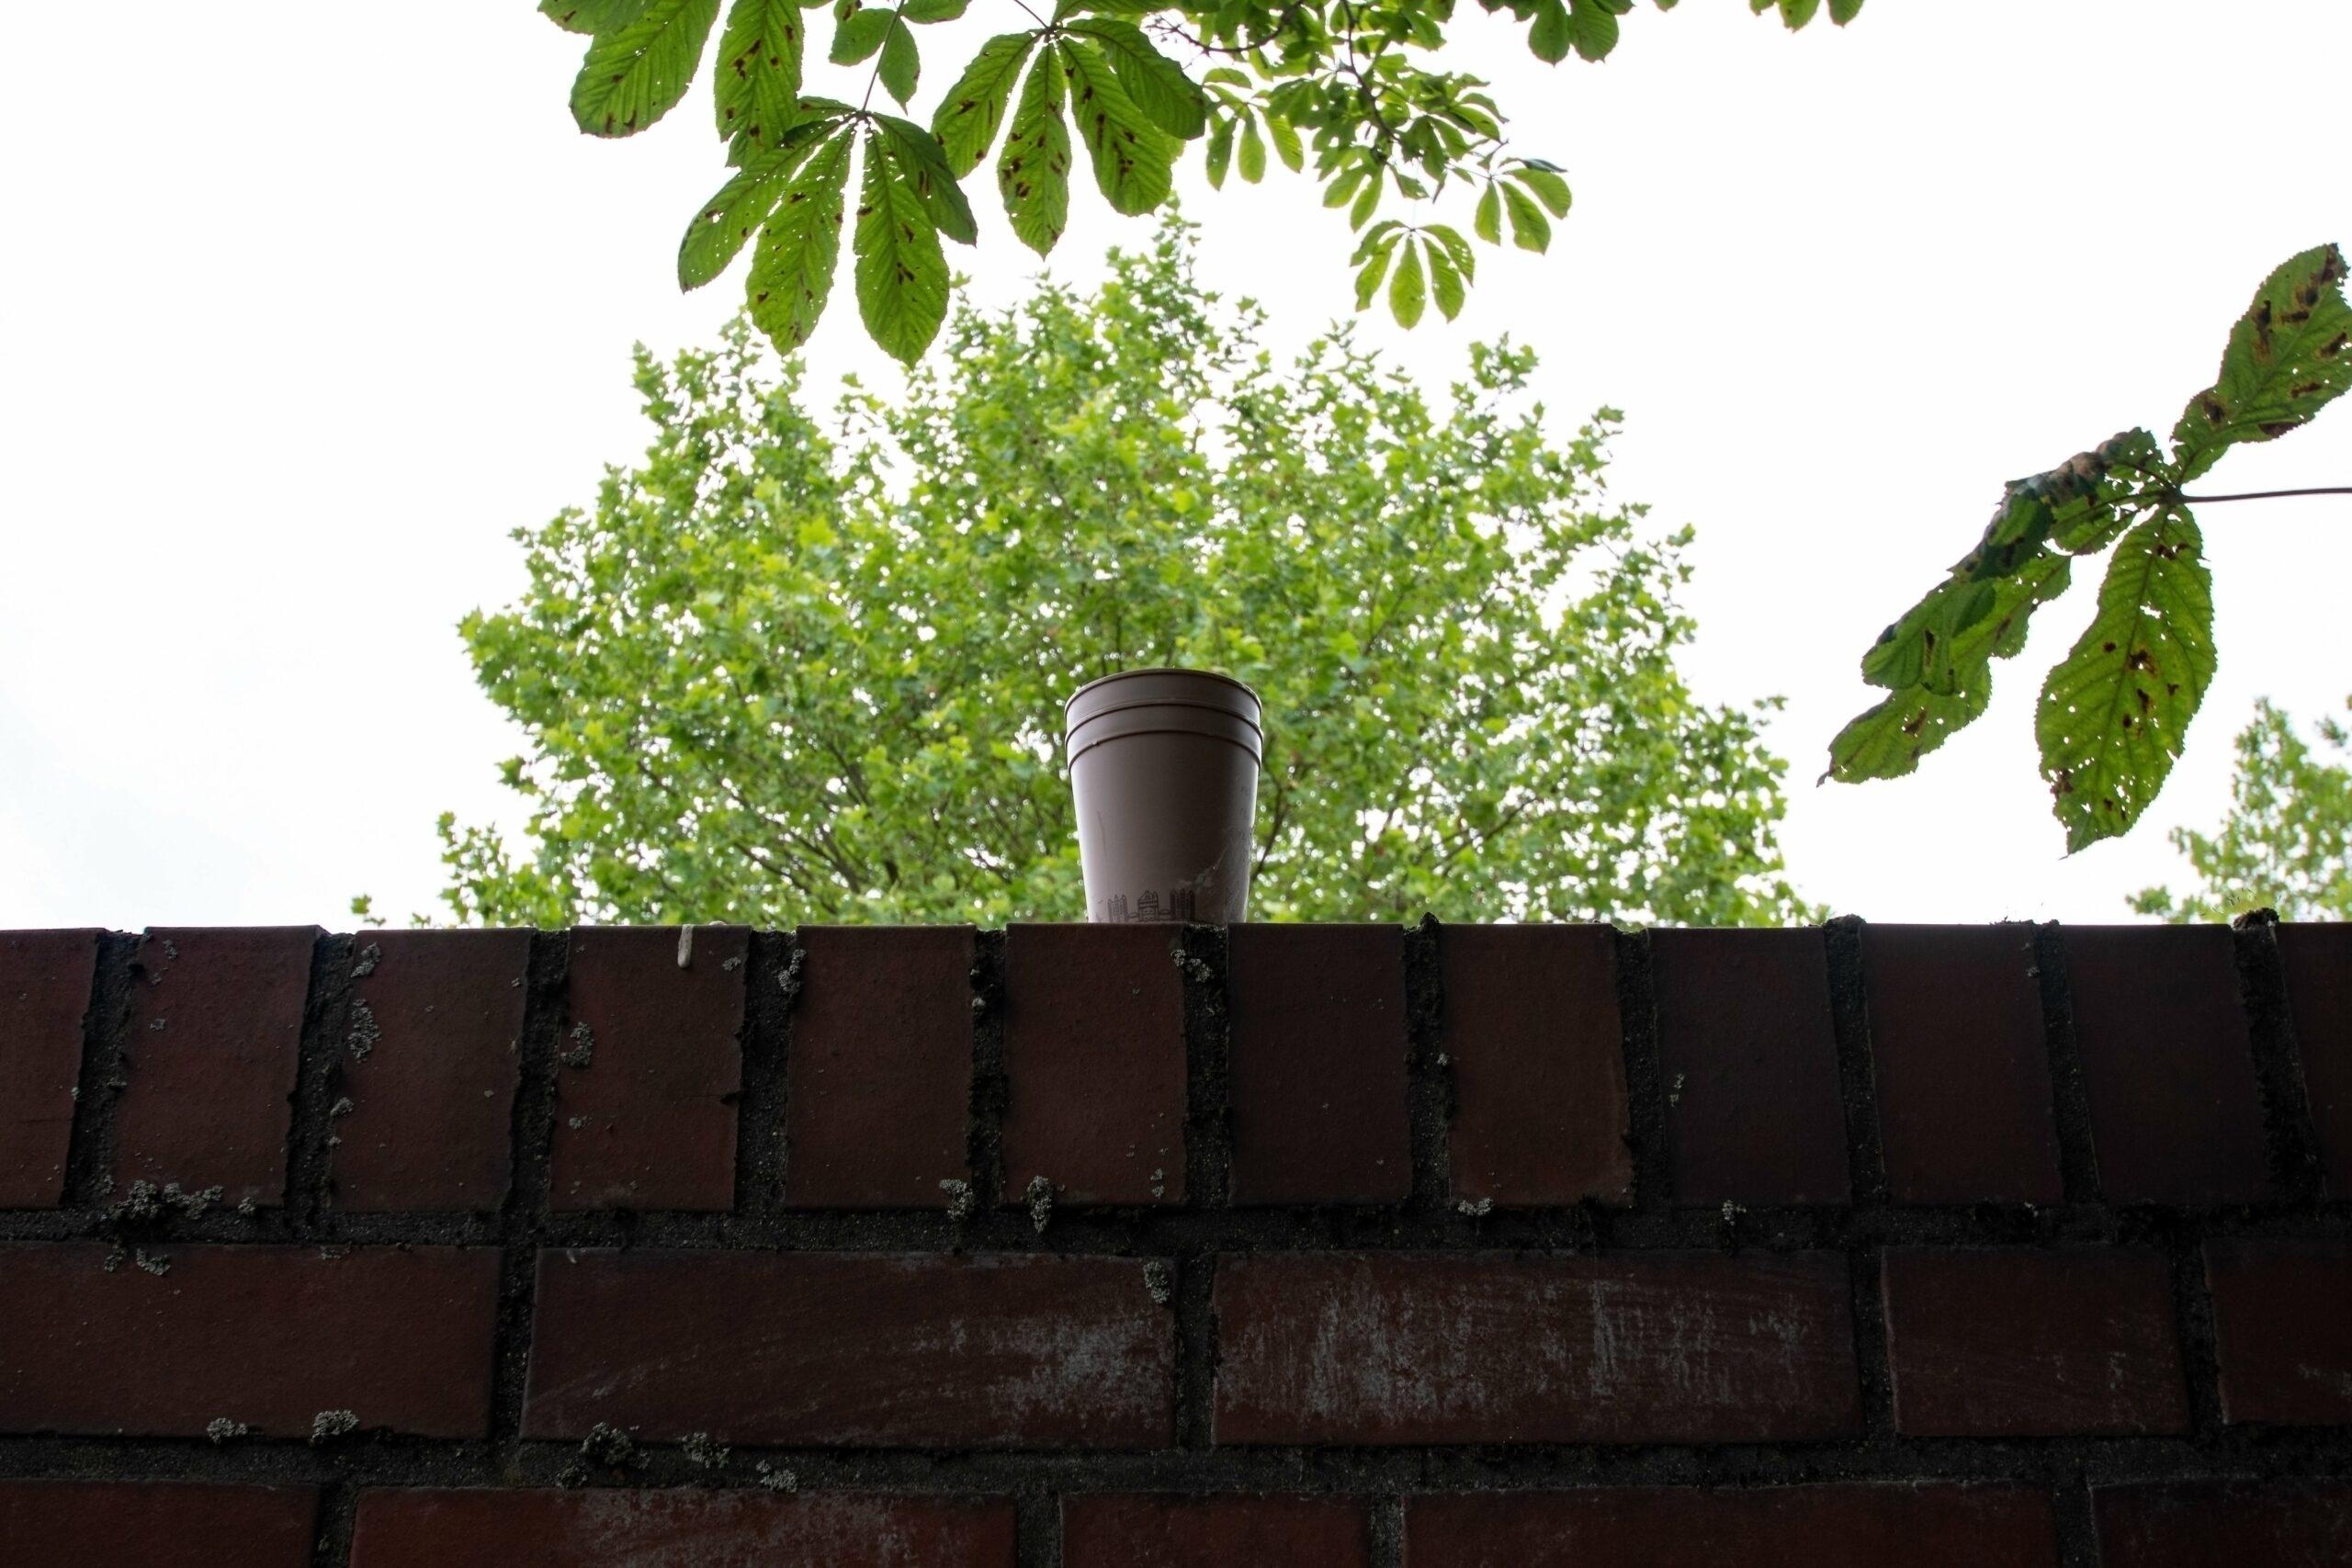 Hans Stötera - Dienstagtour 06.07.2021 - Kaffeepause